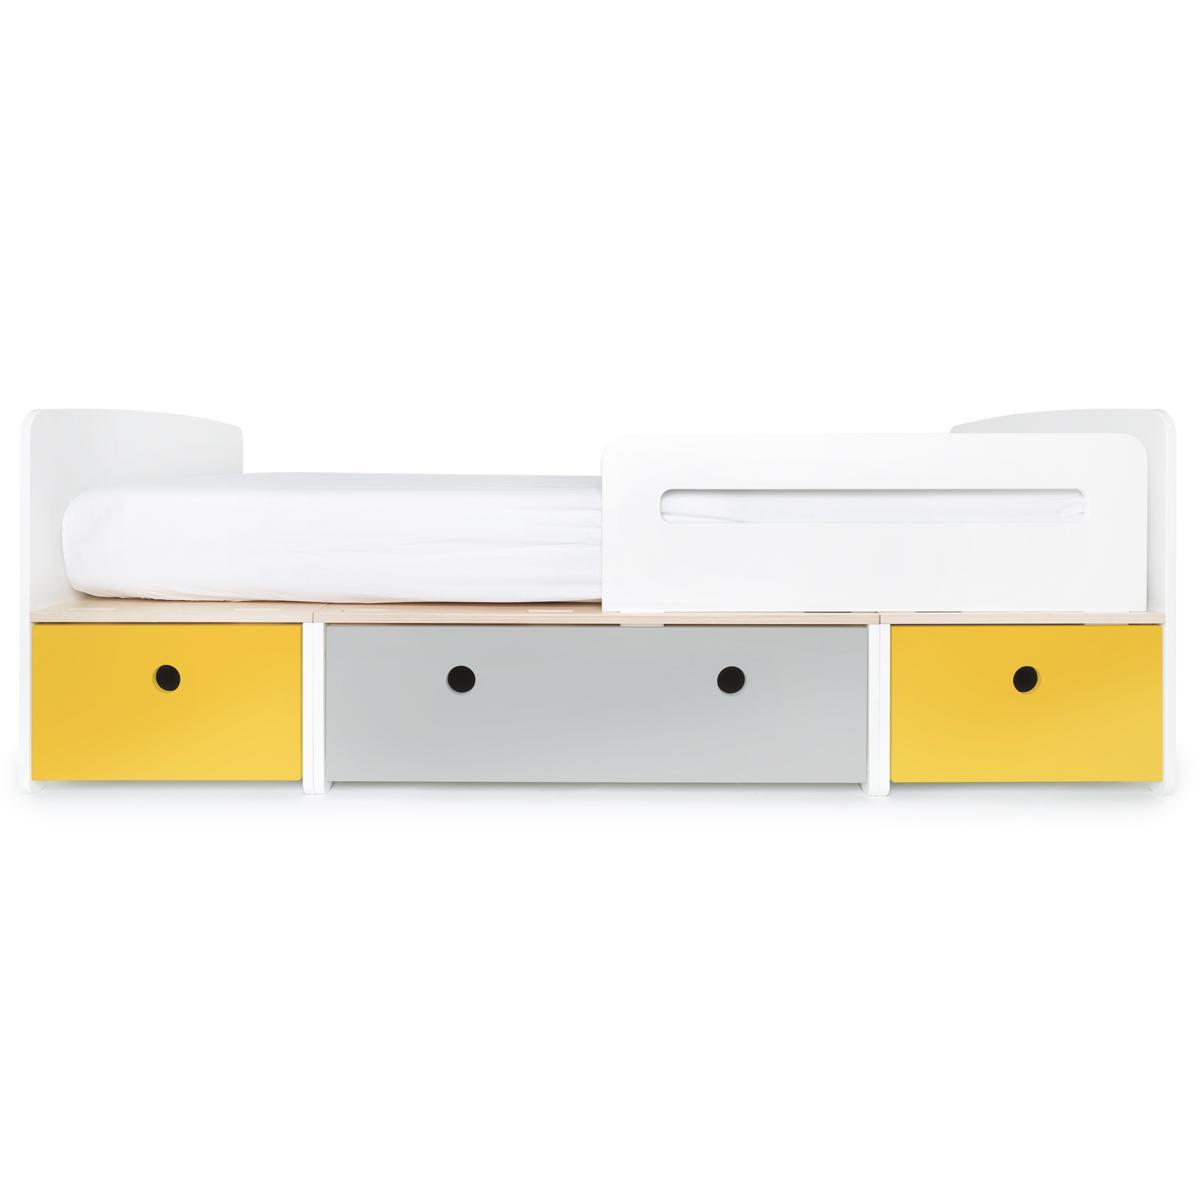 Kinderbett 90x200cm COLORFLEX Abitare Kids nectar yellow-pearl grey-nectar yellow